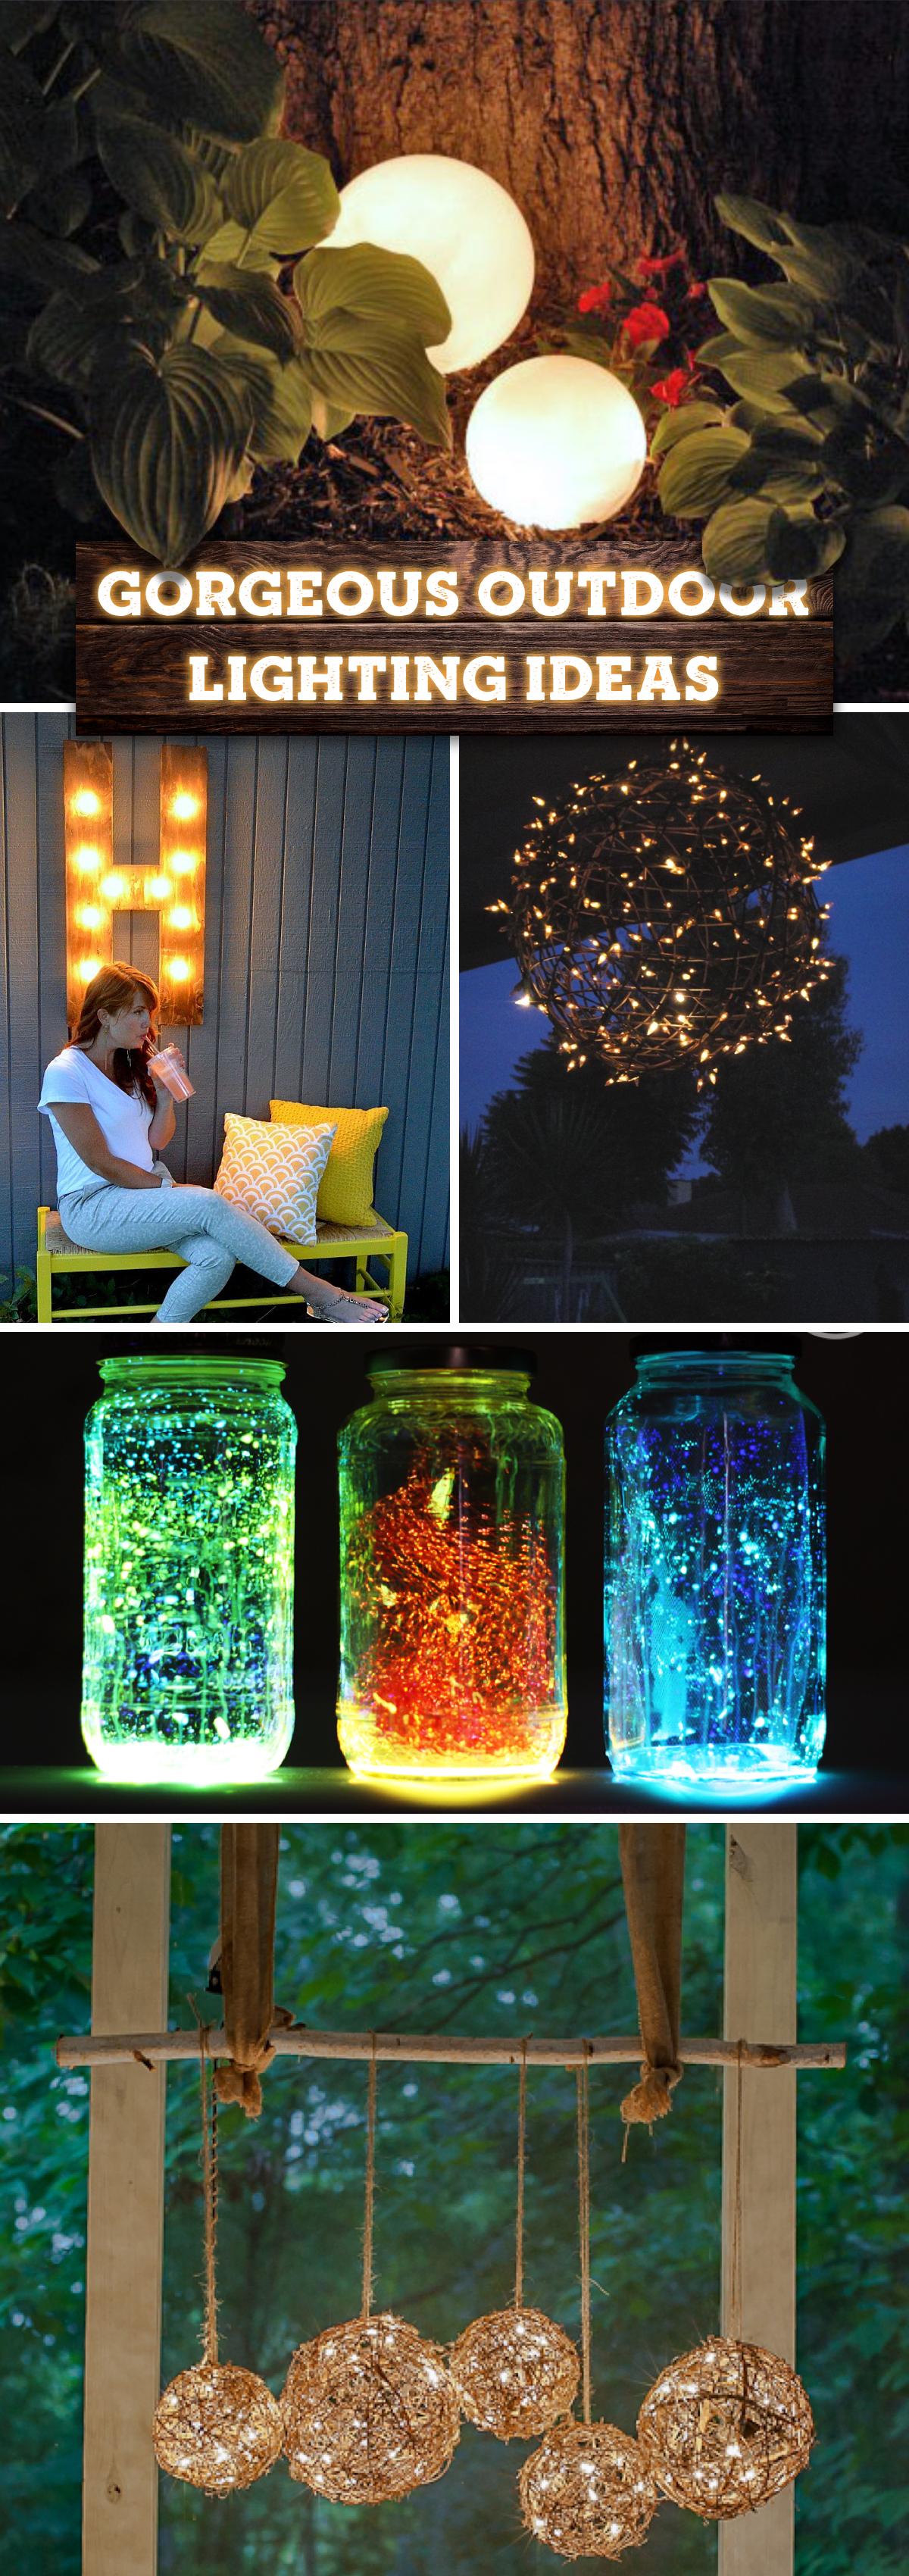 Gorgeous Outdoor Lighting Ideas